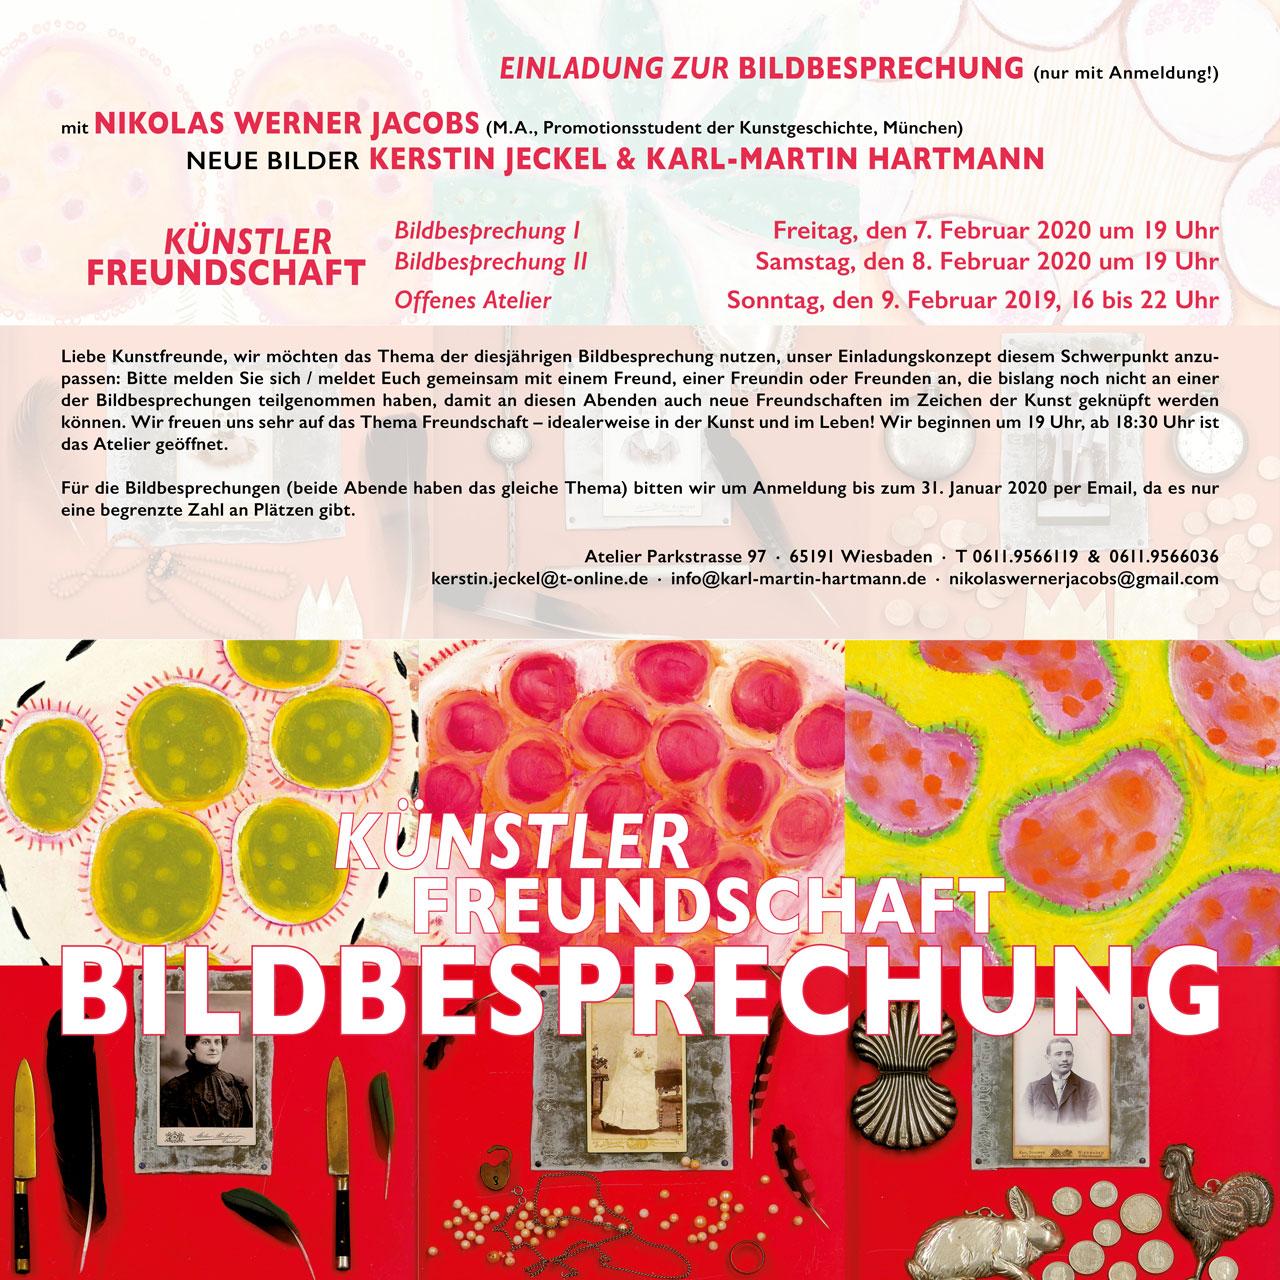 BILDBESPRECHUNG | 2020 © Kerstin Jeckel + Karl-Martin Hartmann